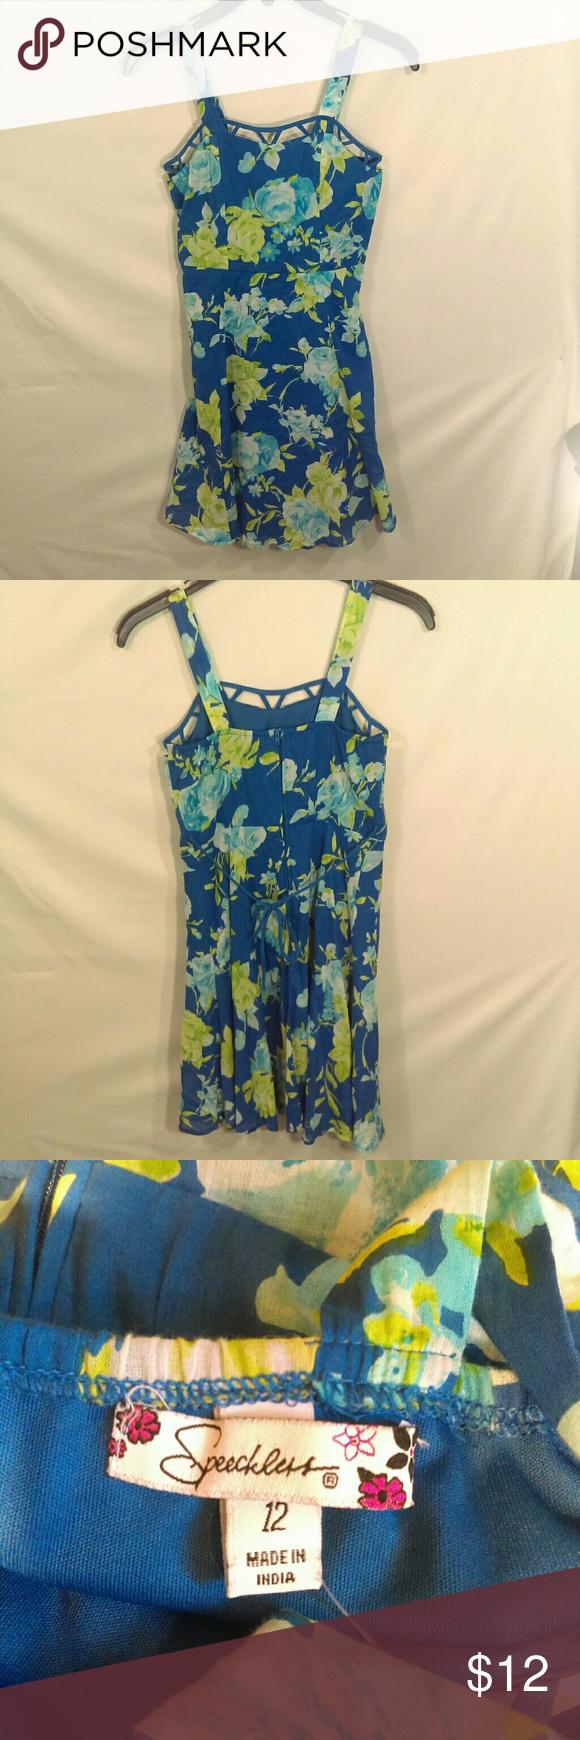 Speechless Girl S Summer Dress Size 12 Summer Dresses Girls Dresses Summer Dresses [ 1740 x 580 Pixel ]